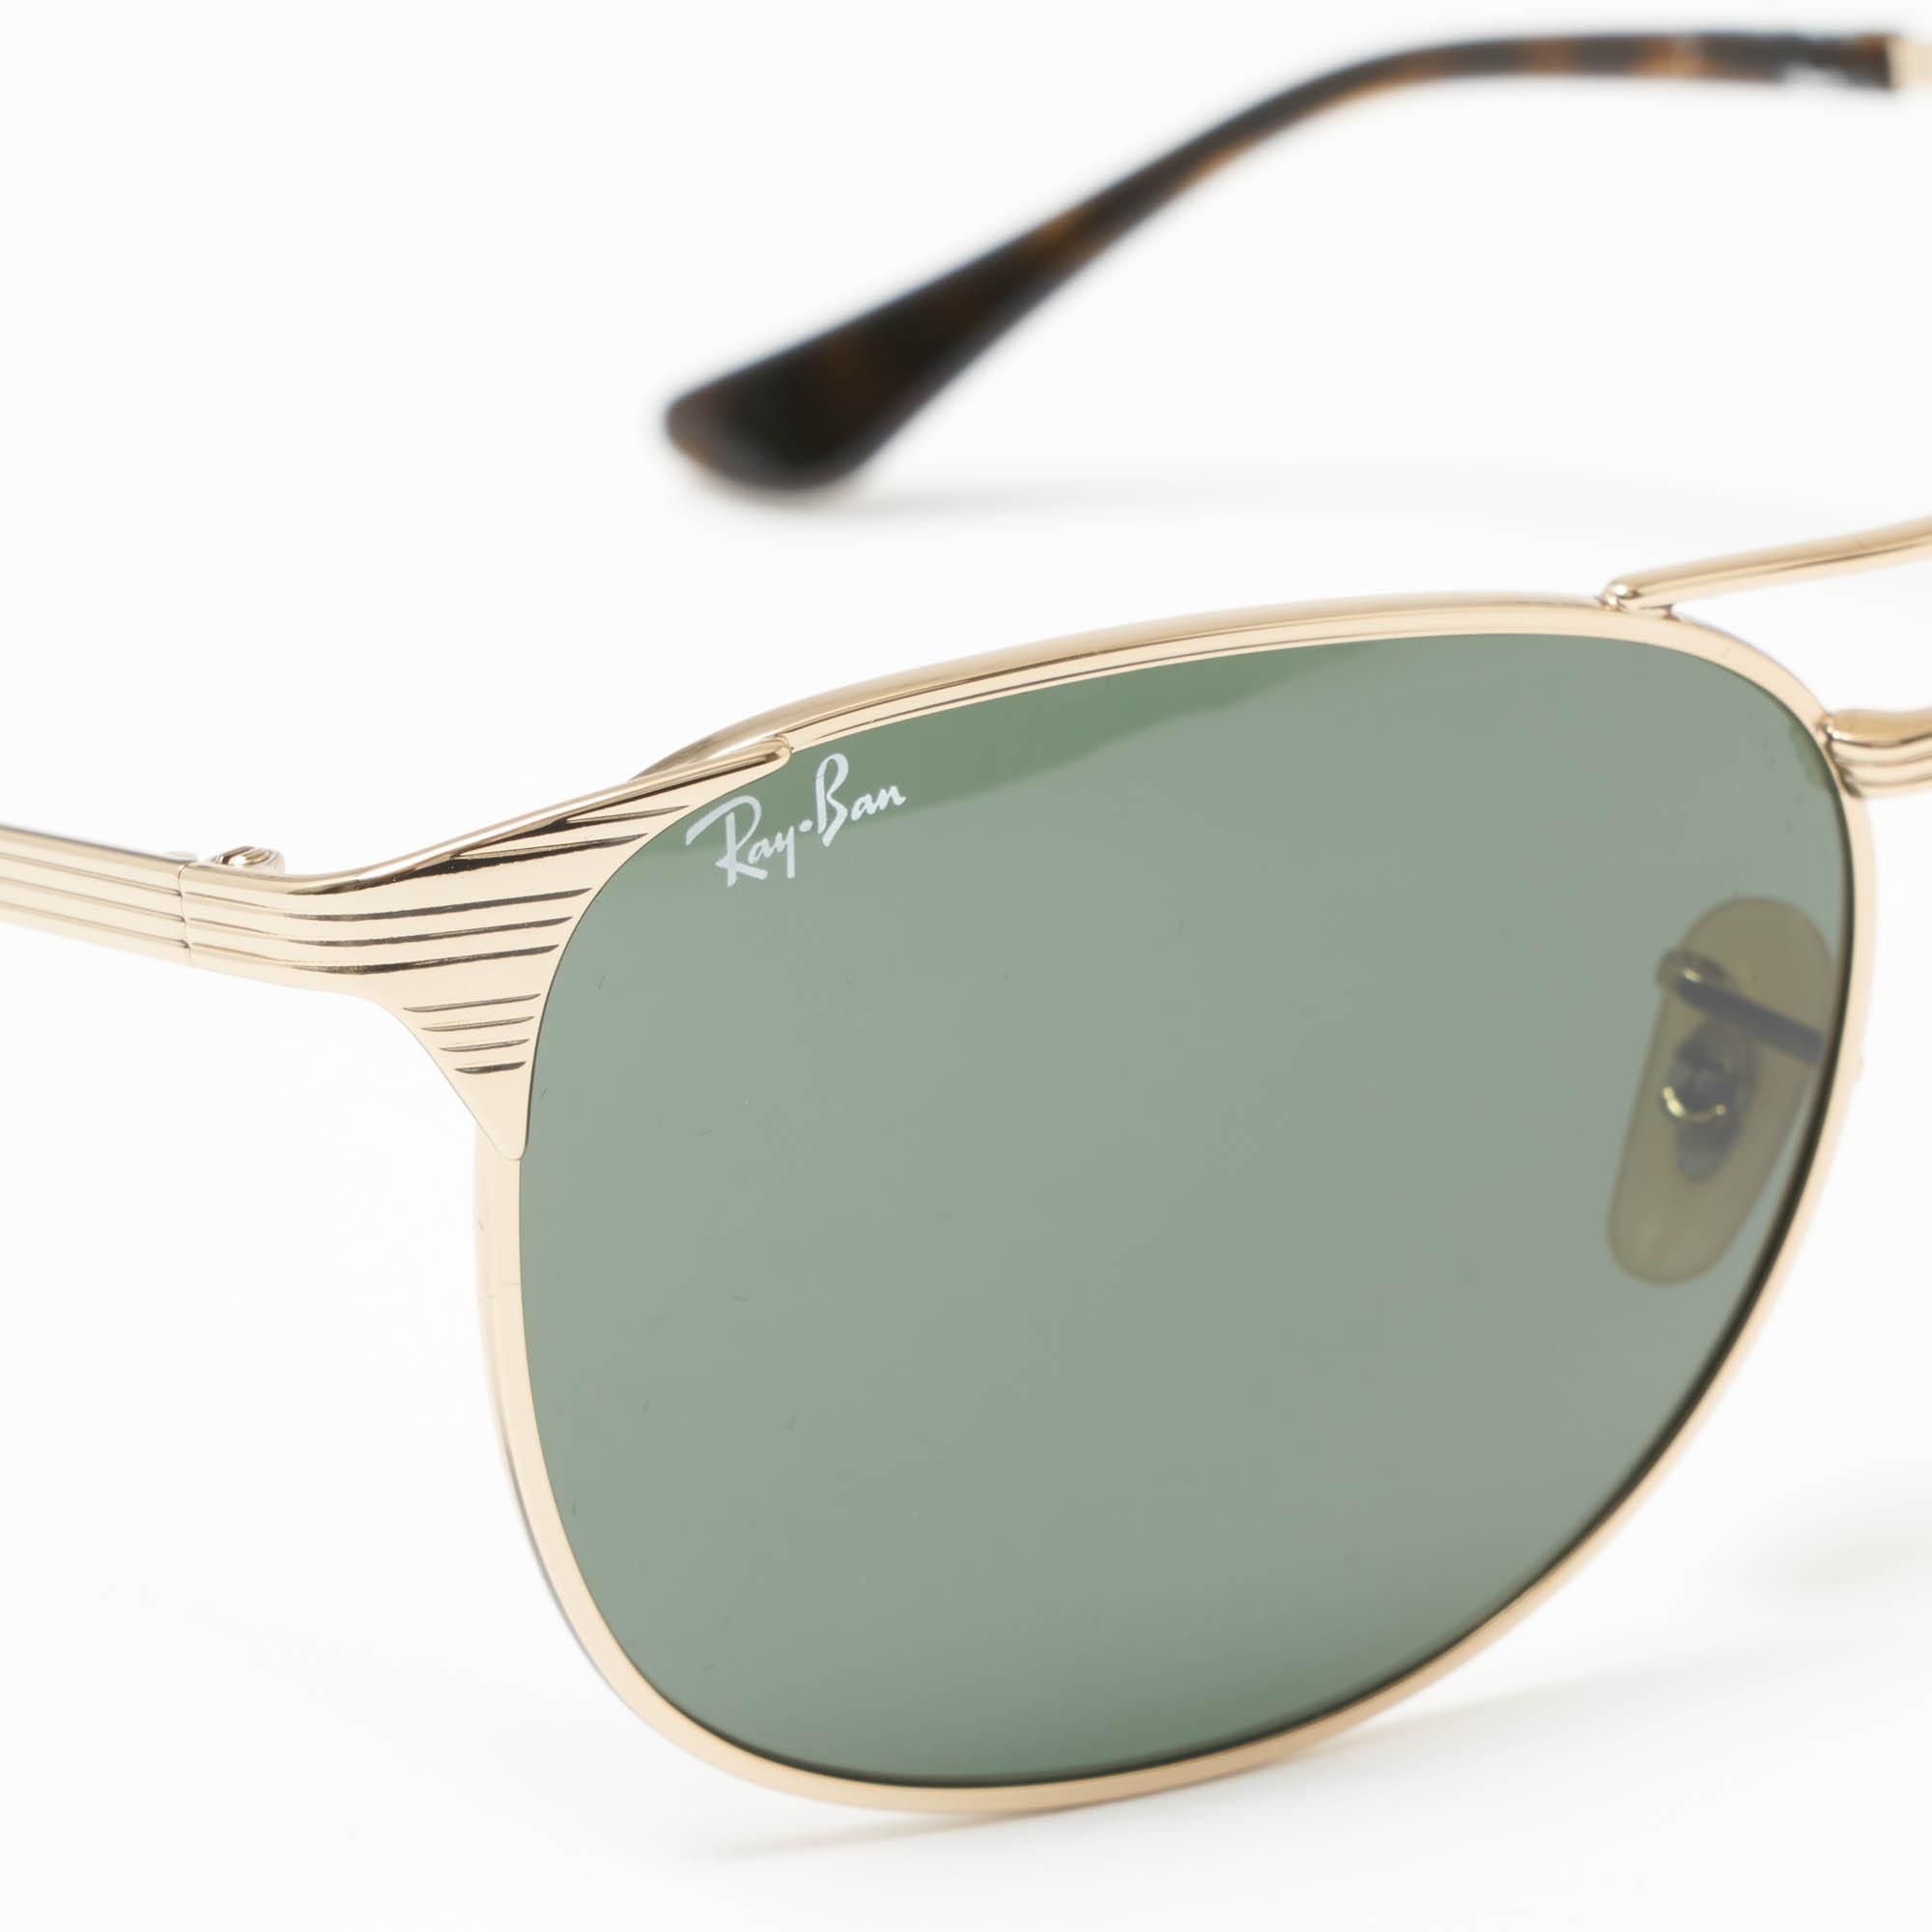 6b71d4ac8c9 Ray-Ban - Metallic Gold Signet Sunglasses - Green Classic G-15 Lenses for.  View fullscreen